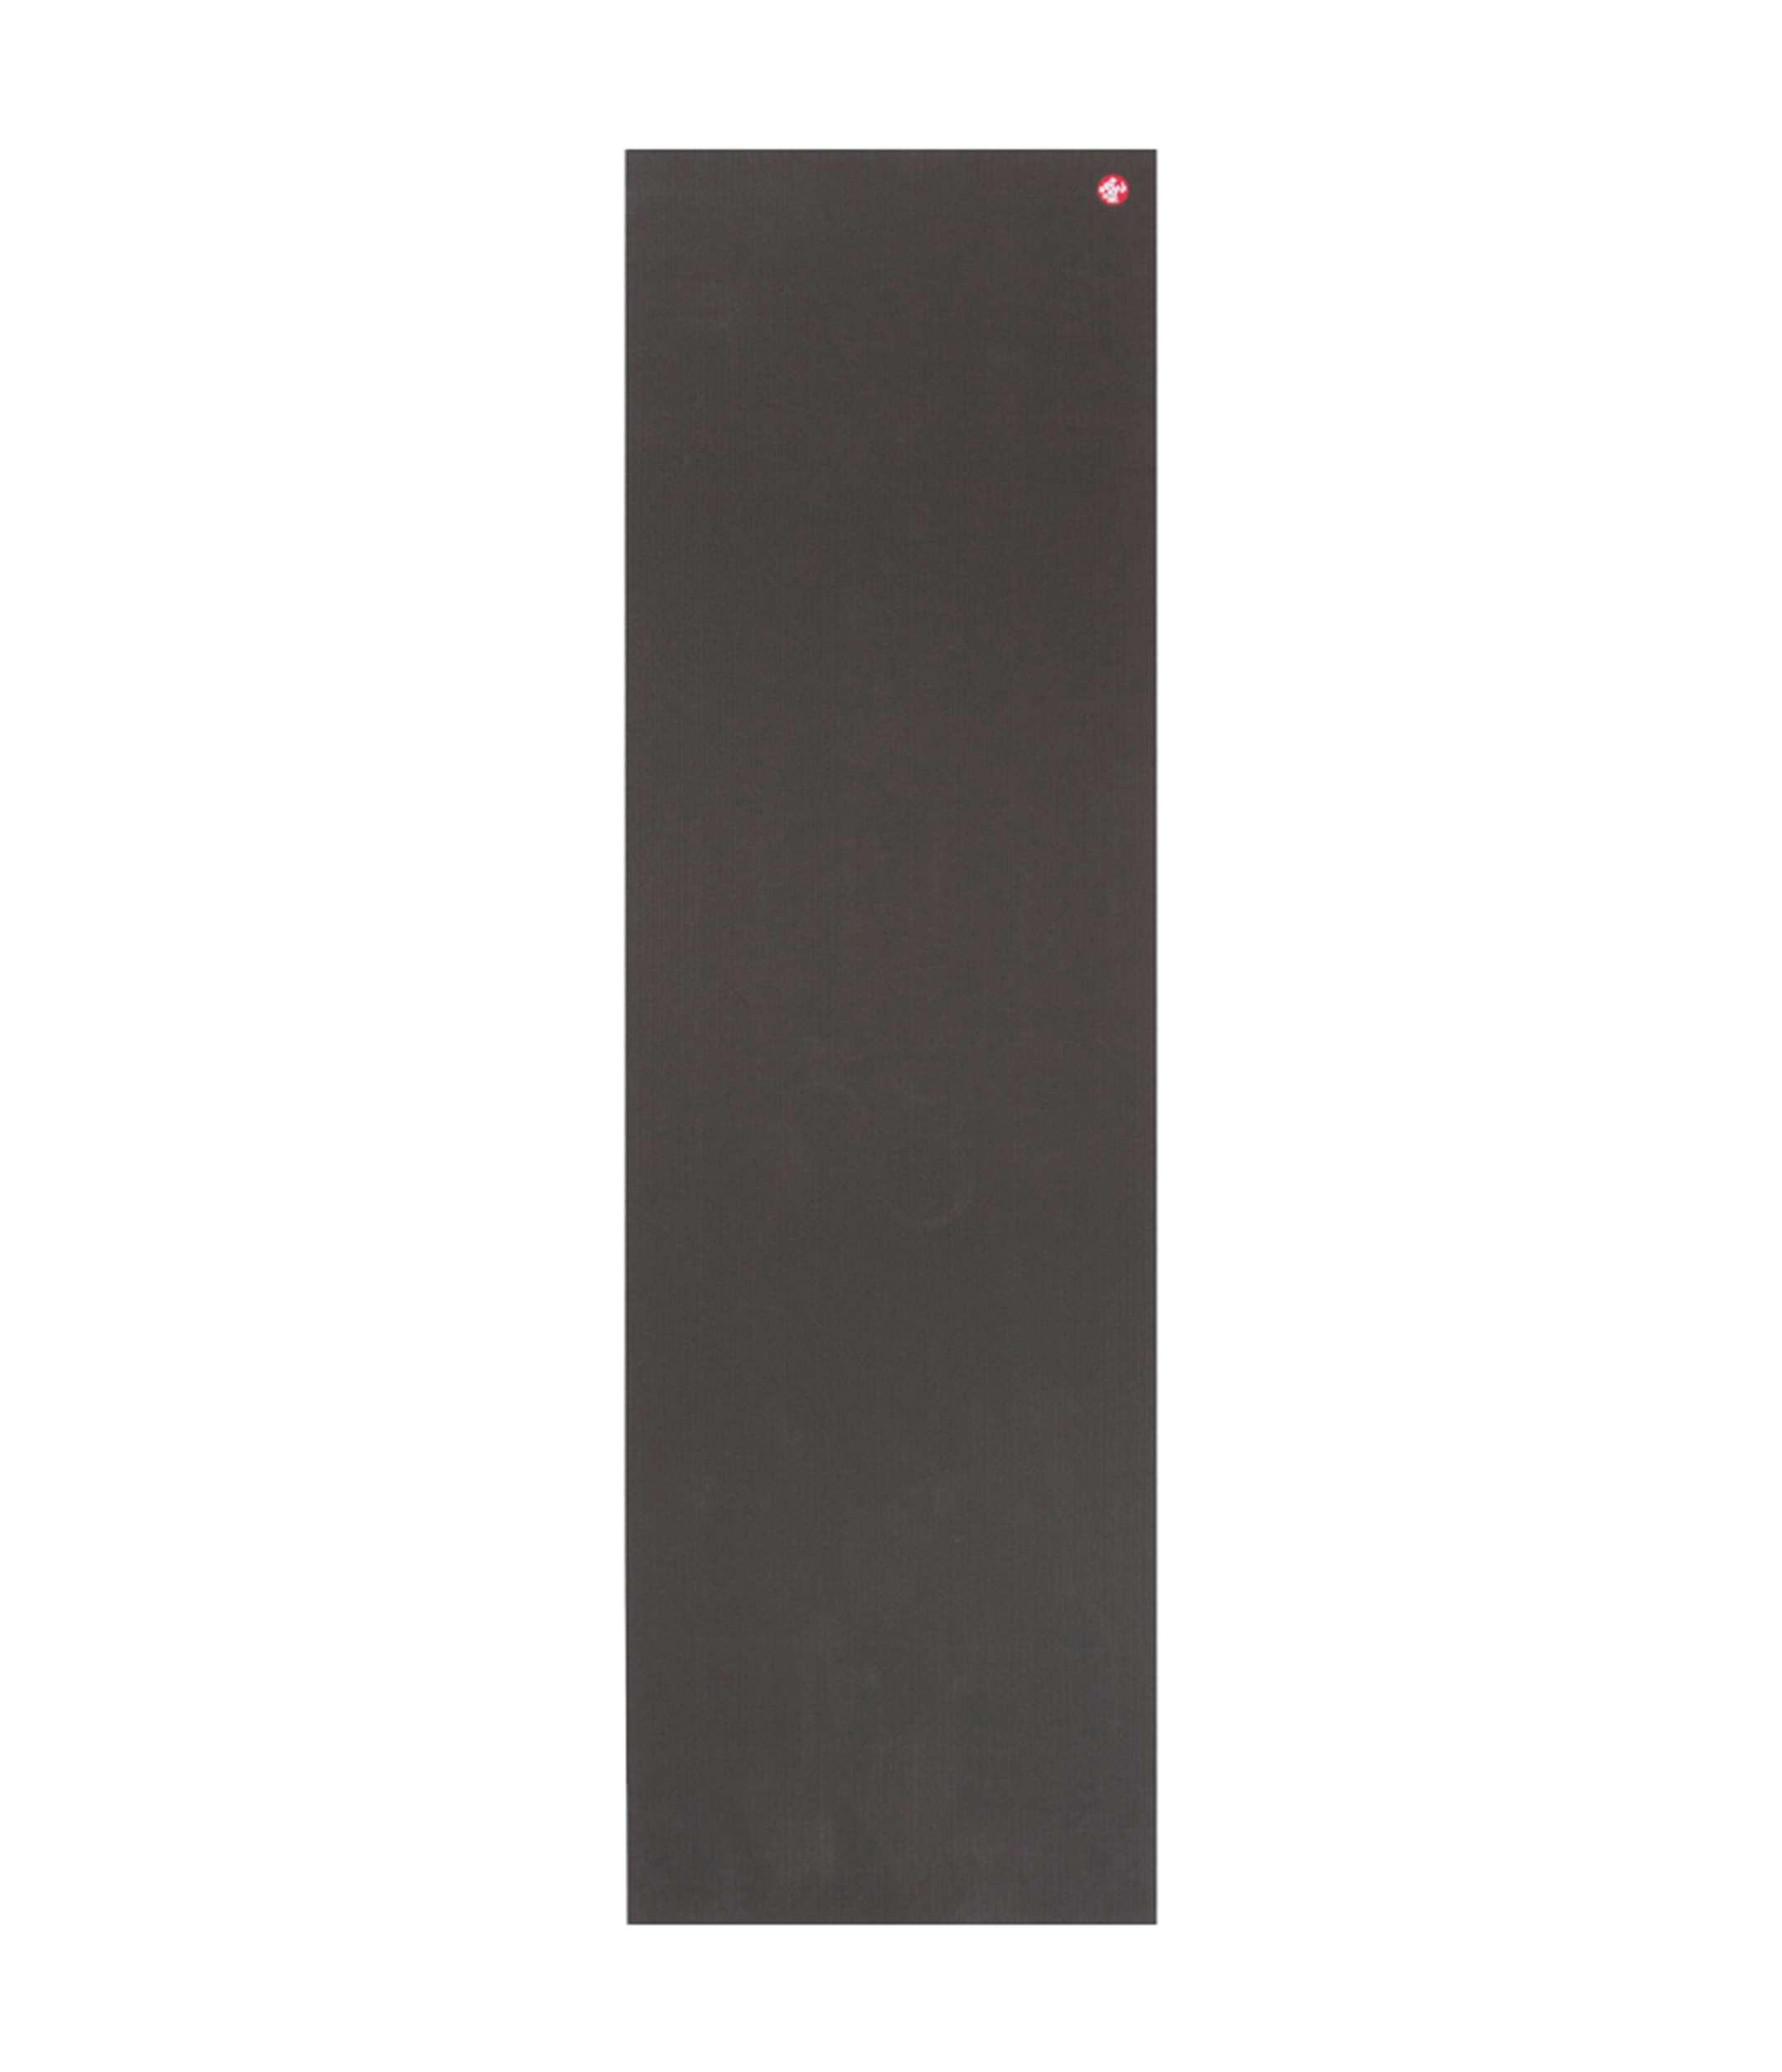 Manduka Pro Yoga Mat black non slip